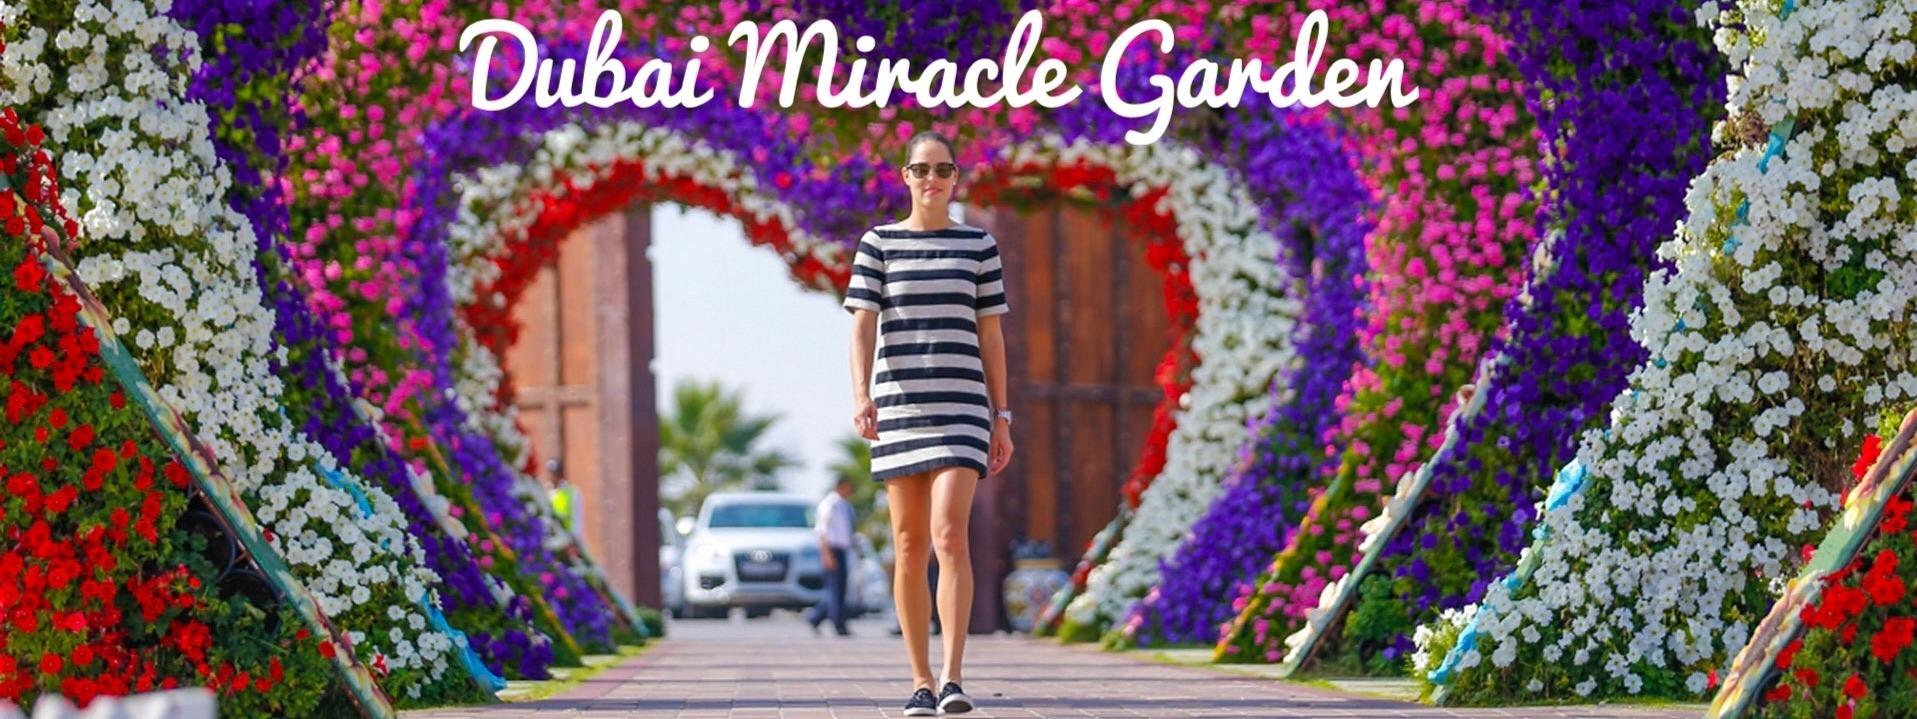 Dubai Miracle Garden 2018 – 2019 - Coming Soon in UAE